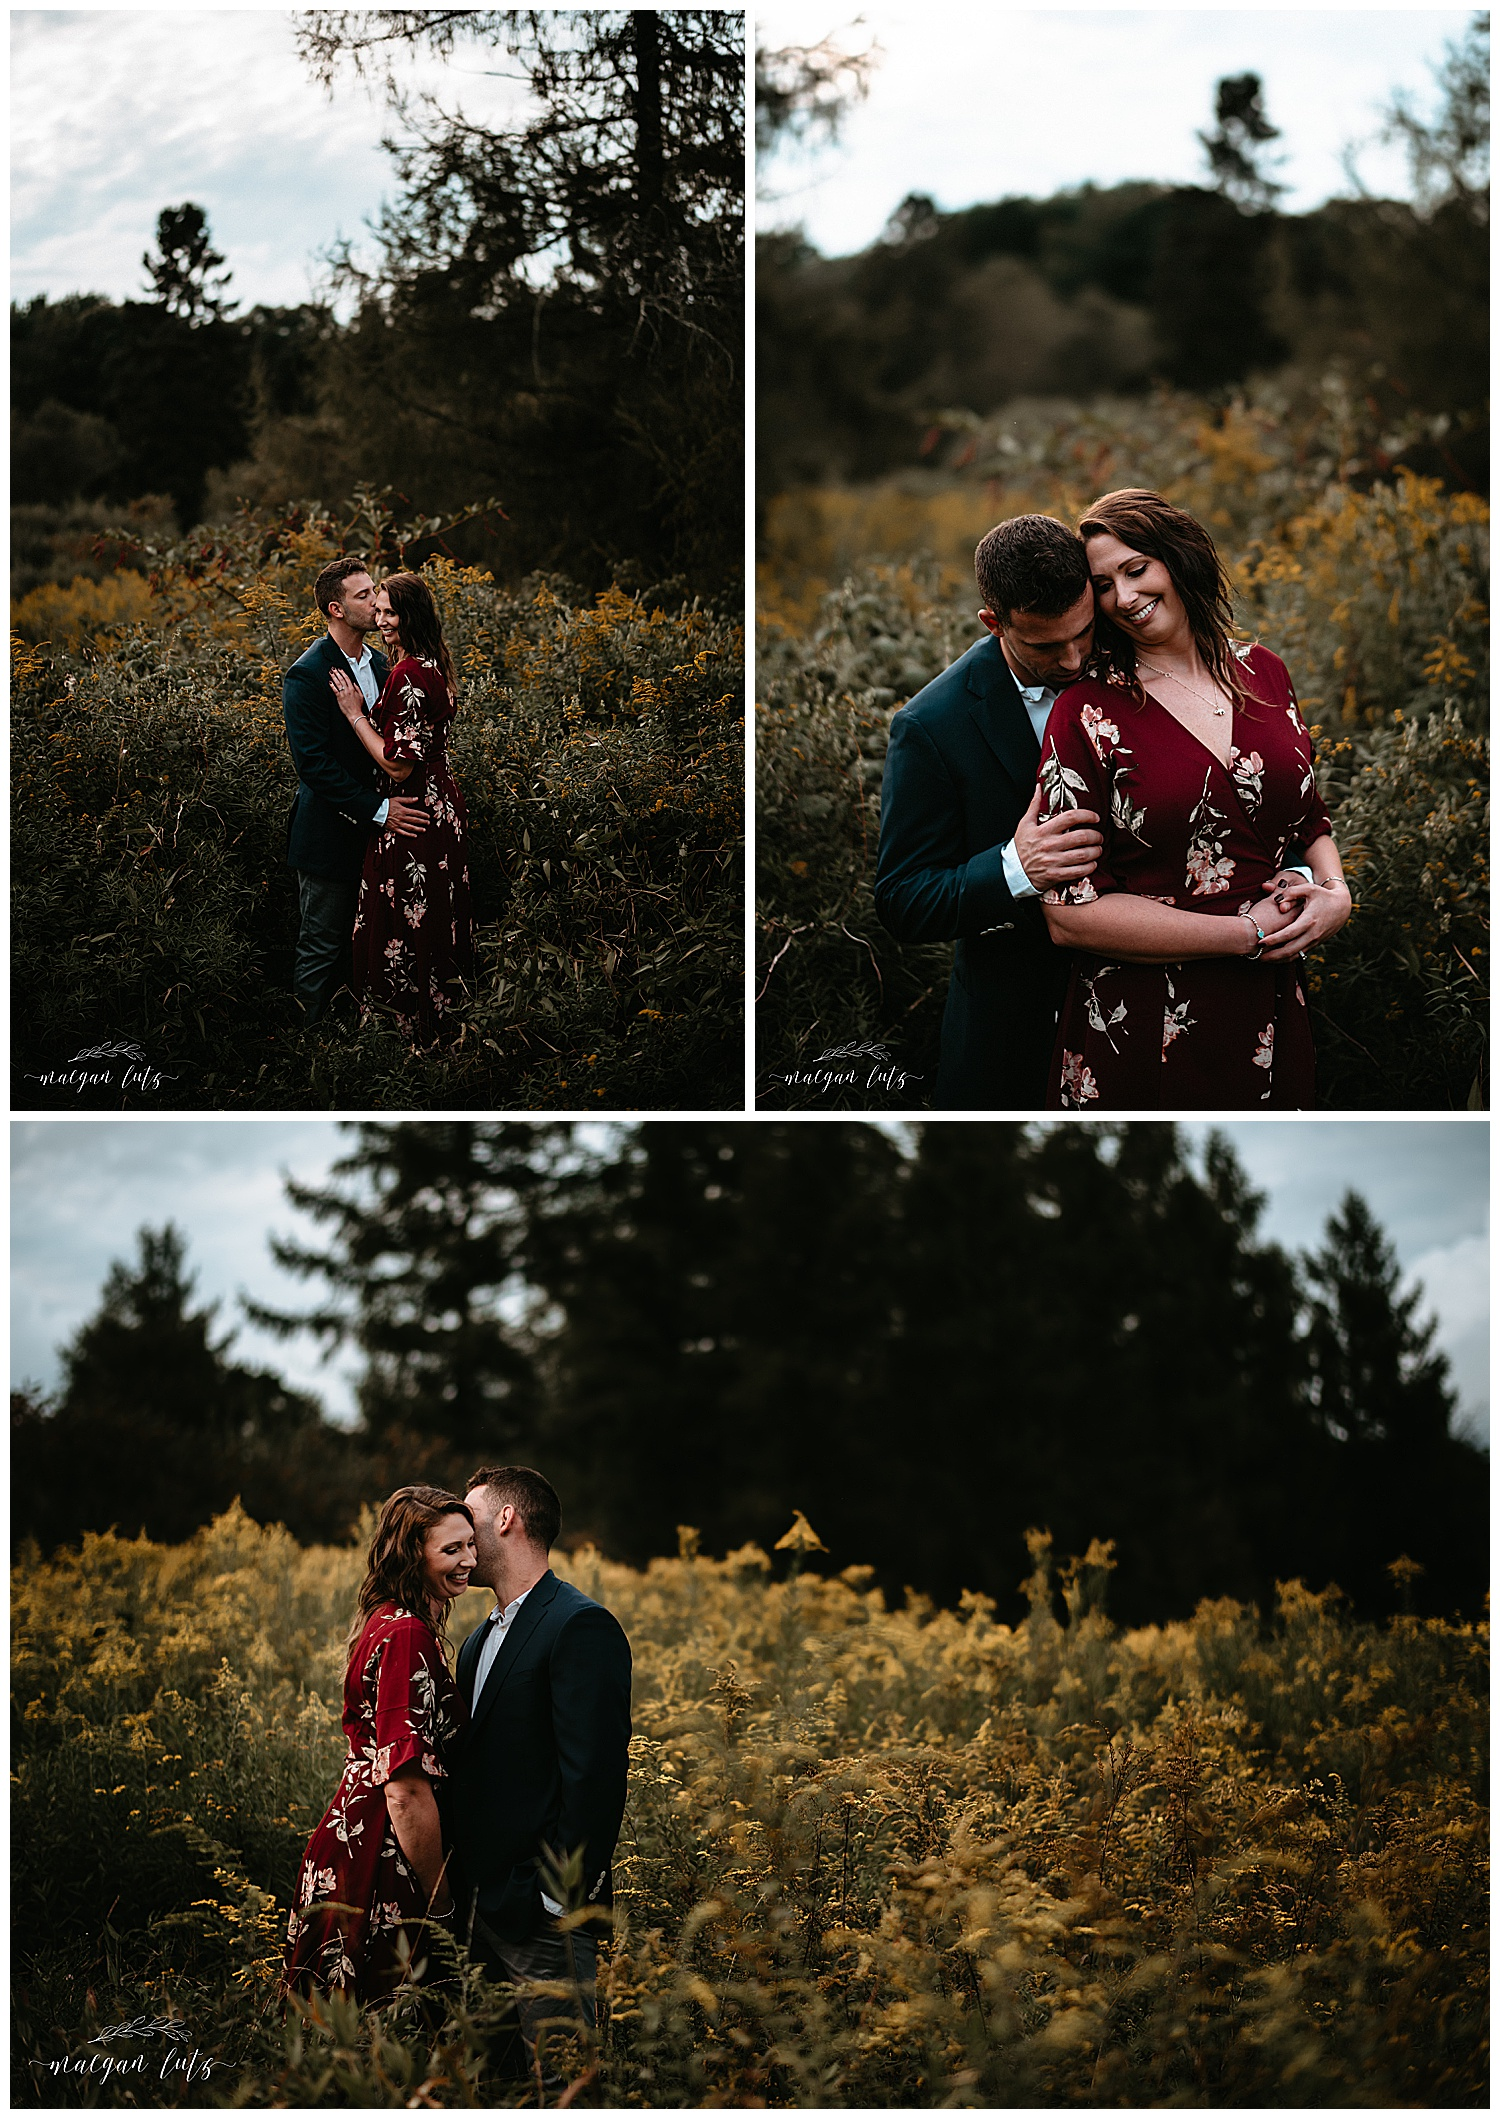 NEPA-Bloomgsburg-Wedding-Photographer-in-the-Lehigh-Valley_0011.jpg